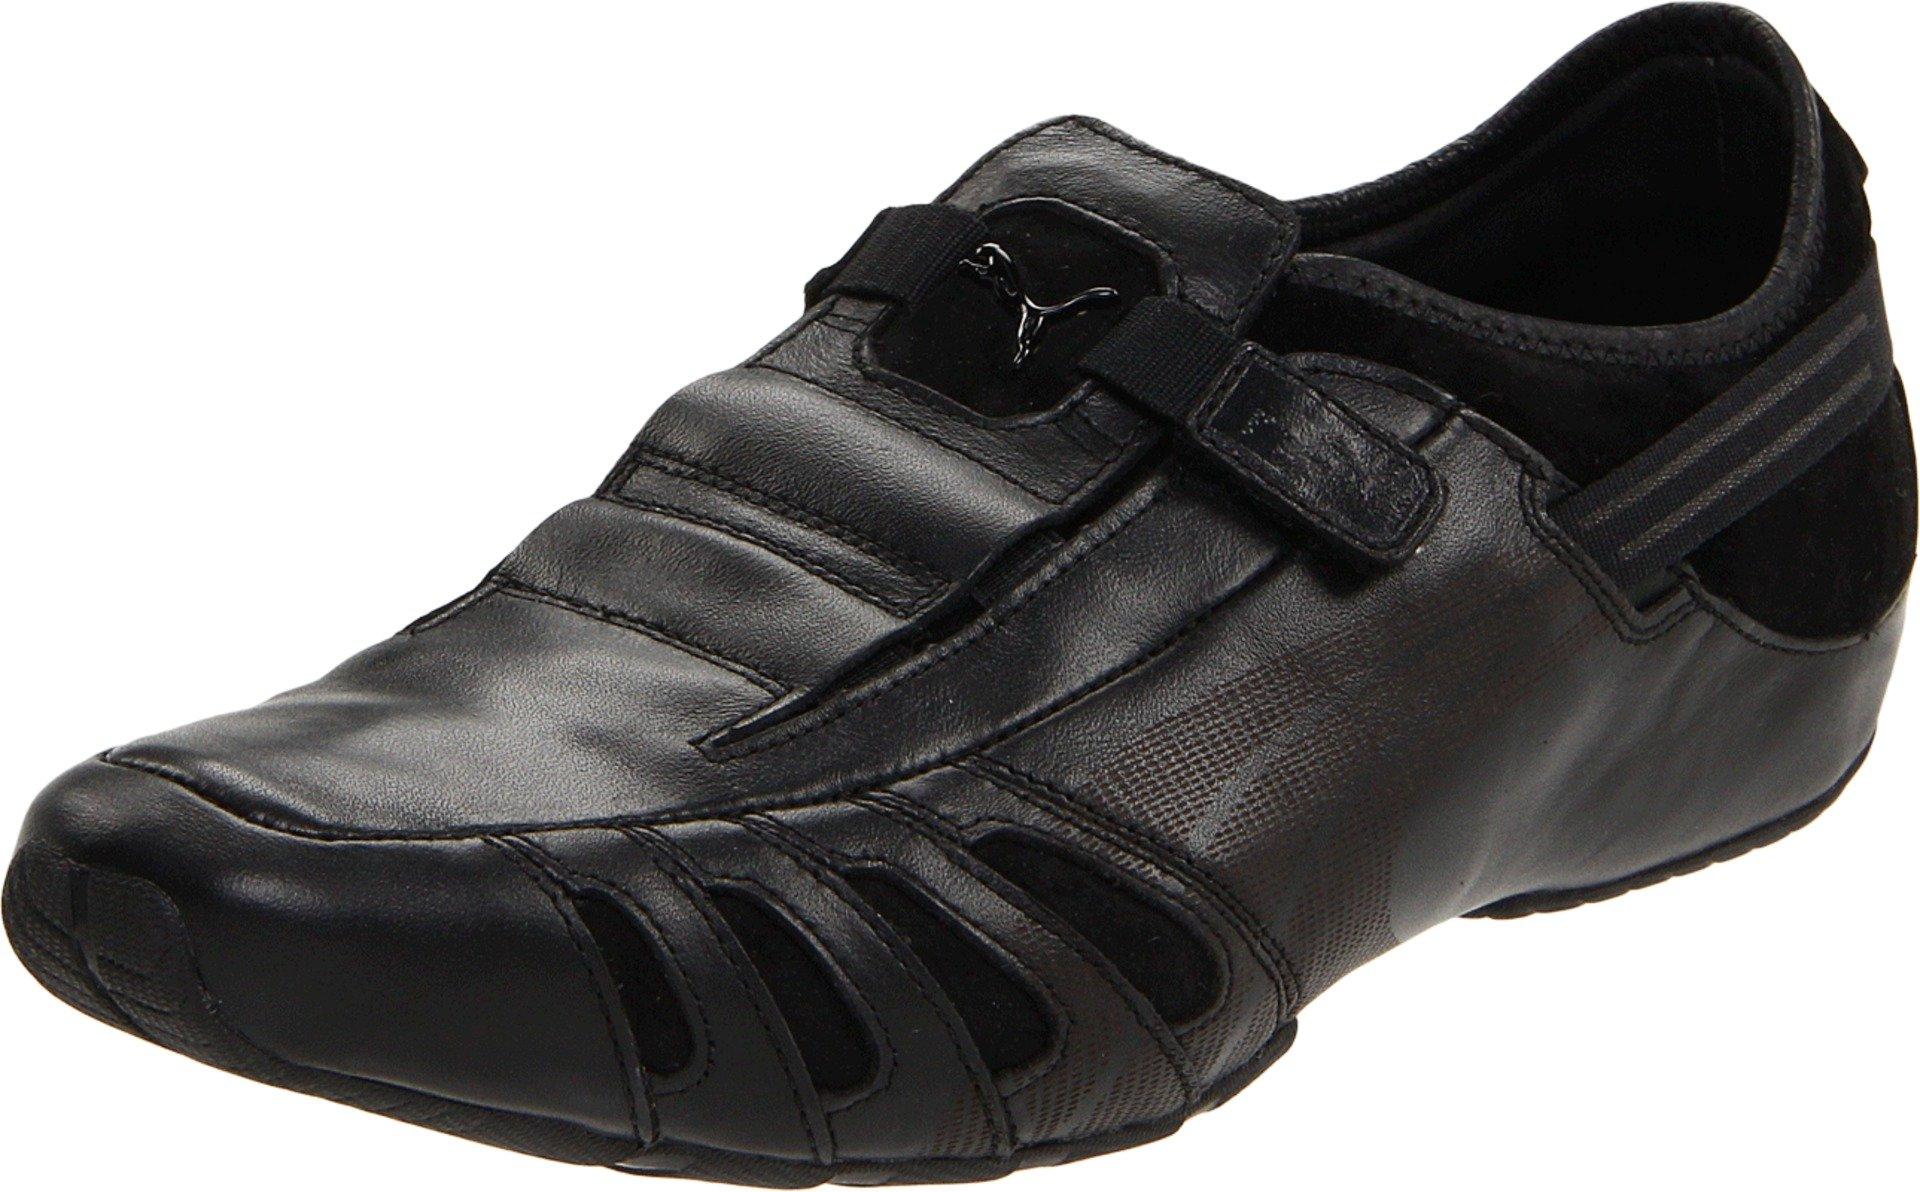 PUMA Men's Vedano Leather Slip-On Shoe,Black/Black/Ribbon Red,9.5US/ D US